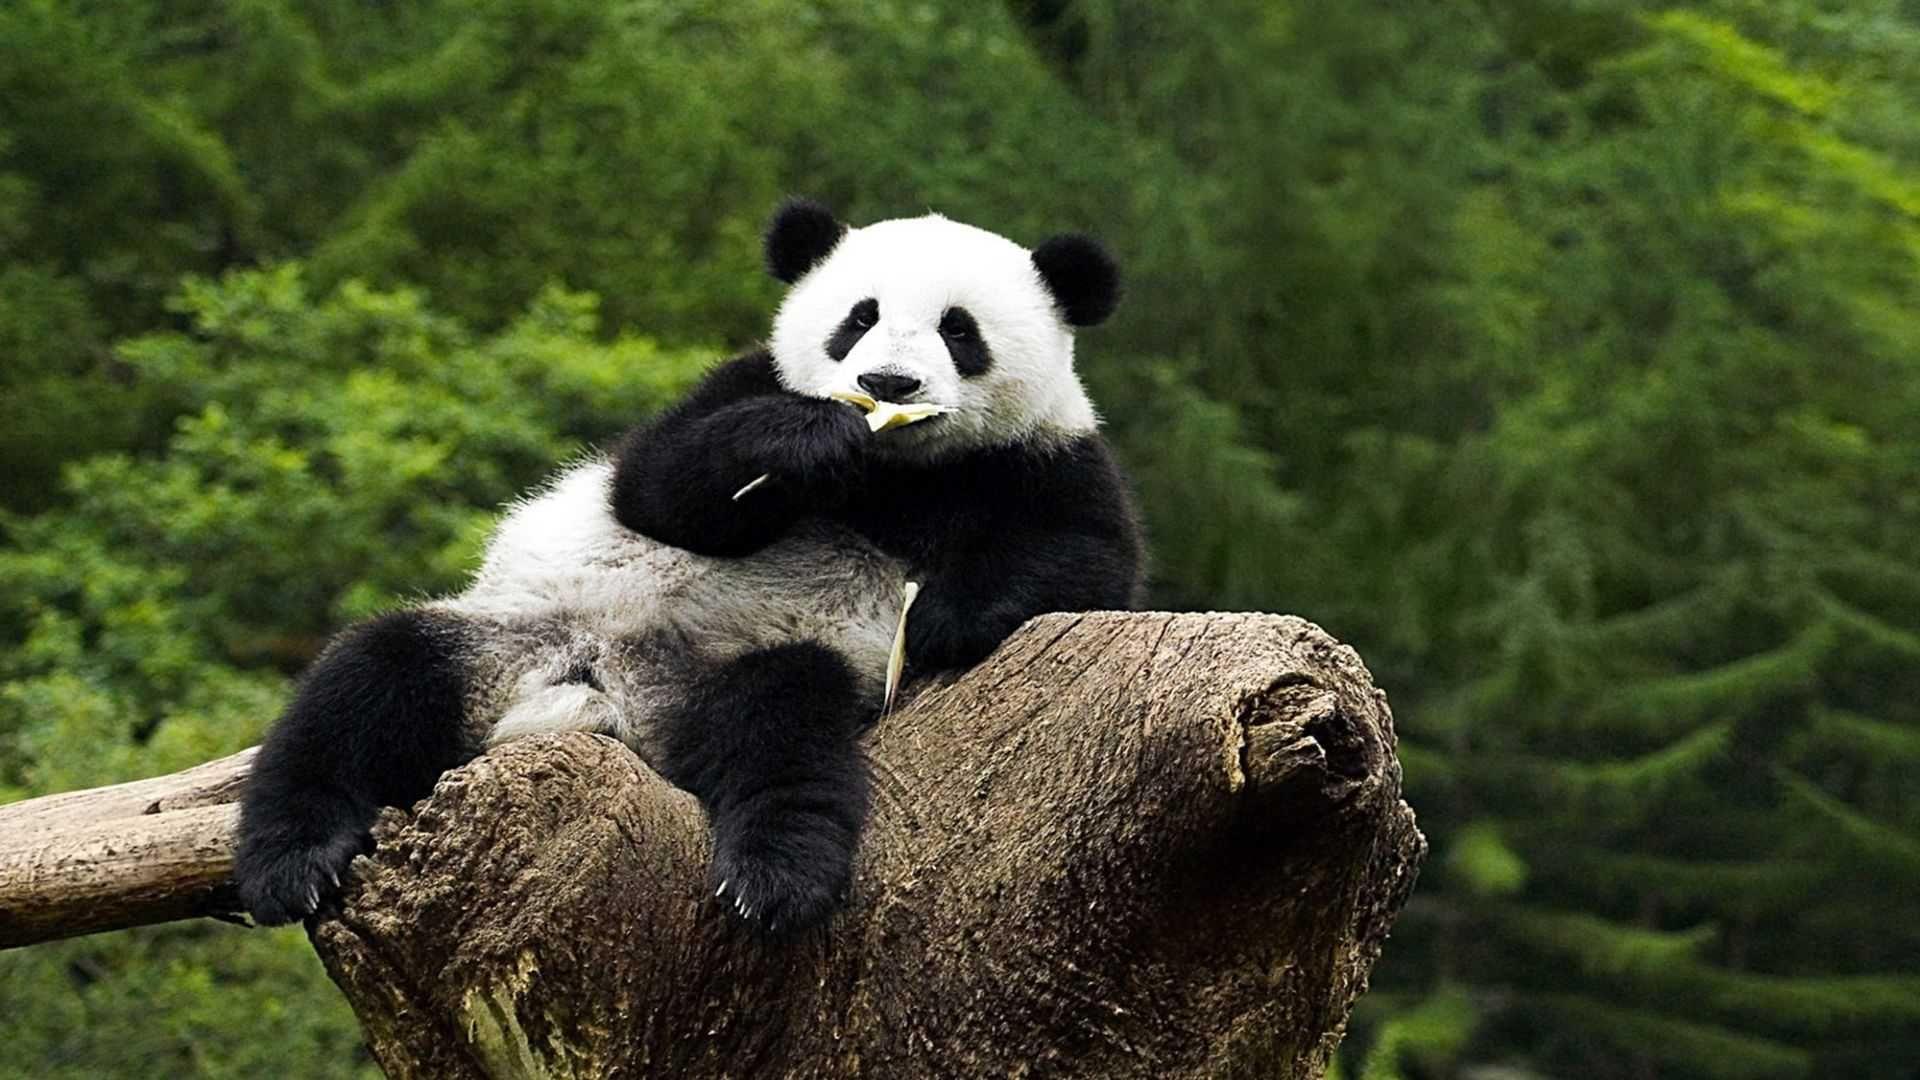 Wallpapers On Desktop Panda